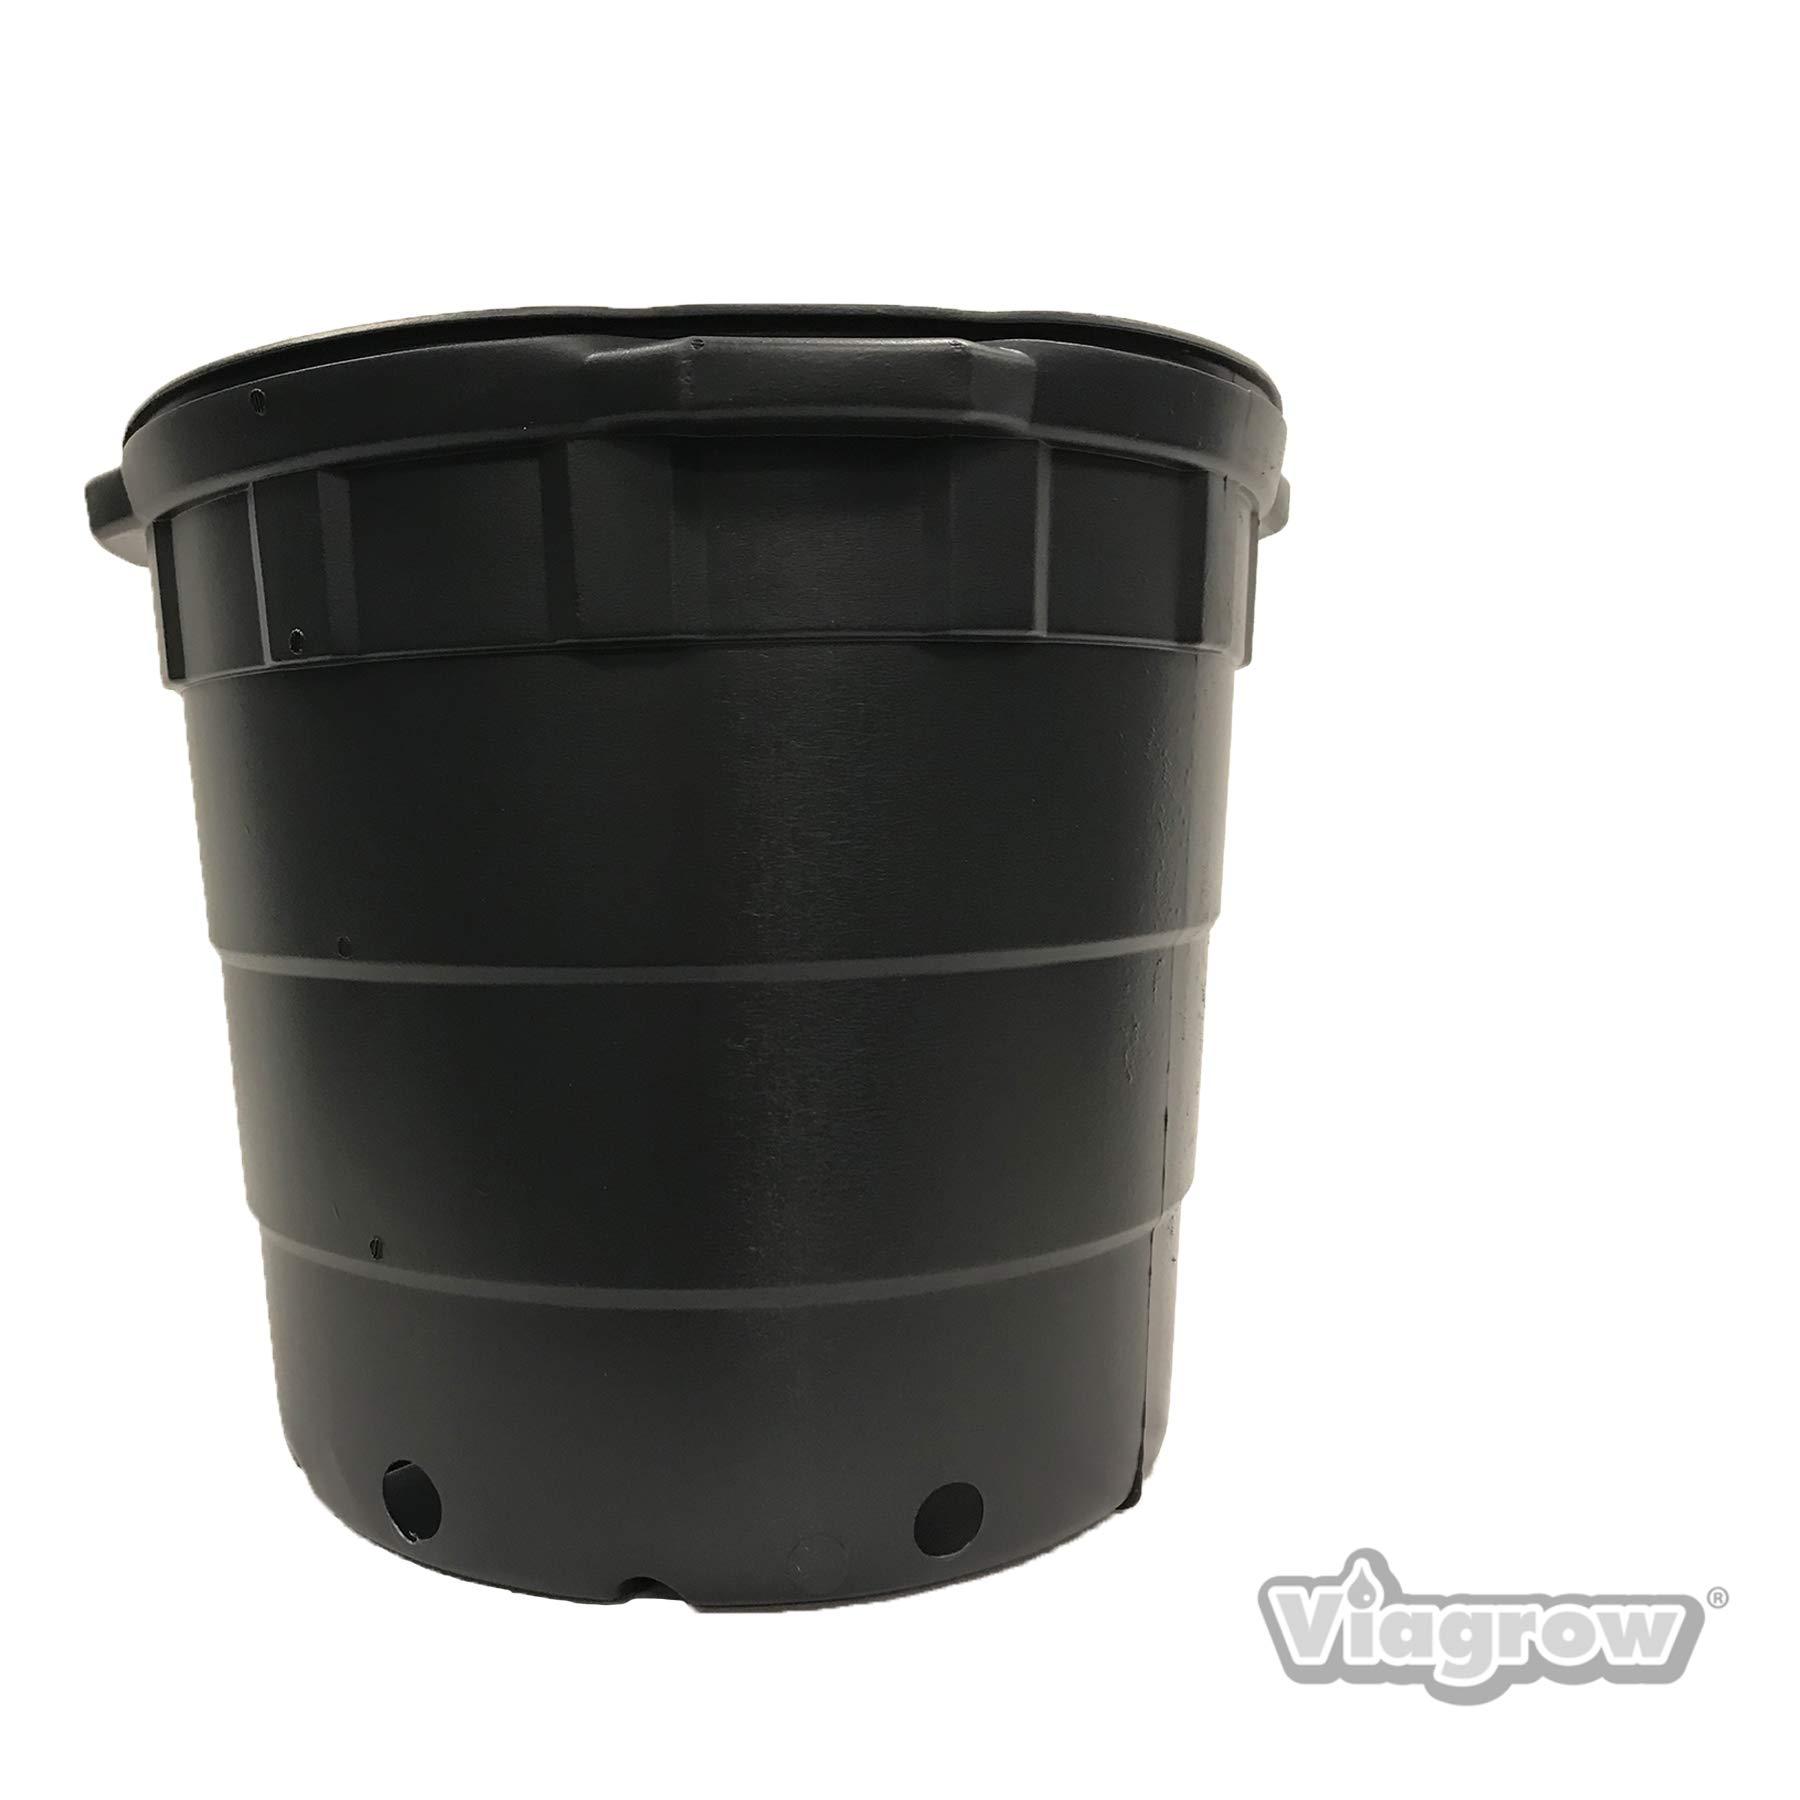 Viagrow 10 gallon Round Nursery Pots - 10 Pack